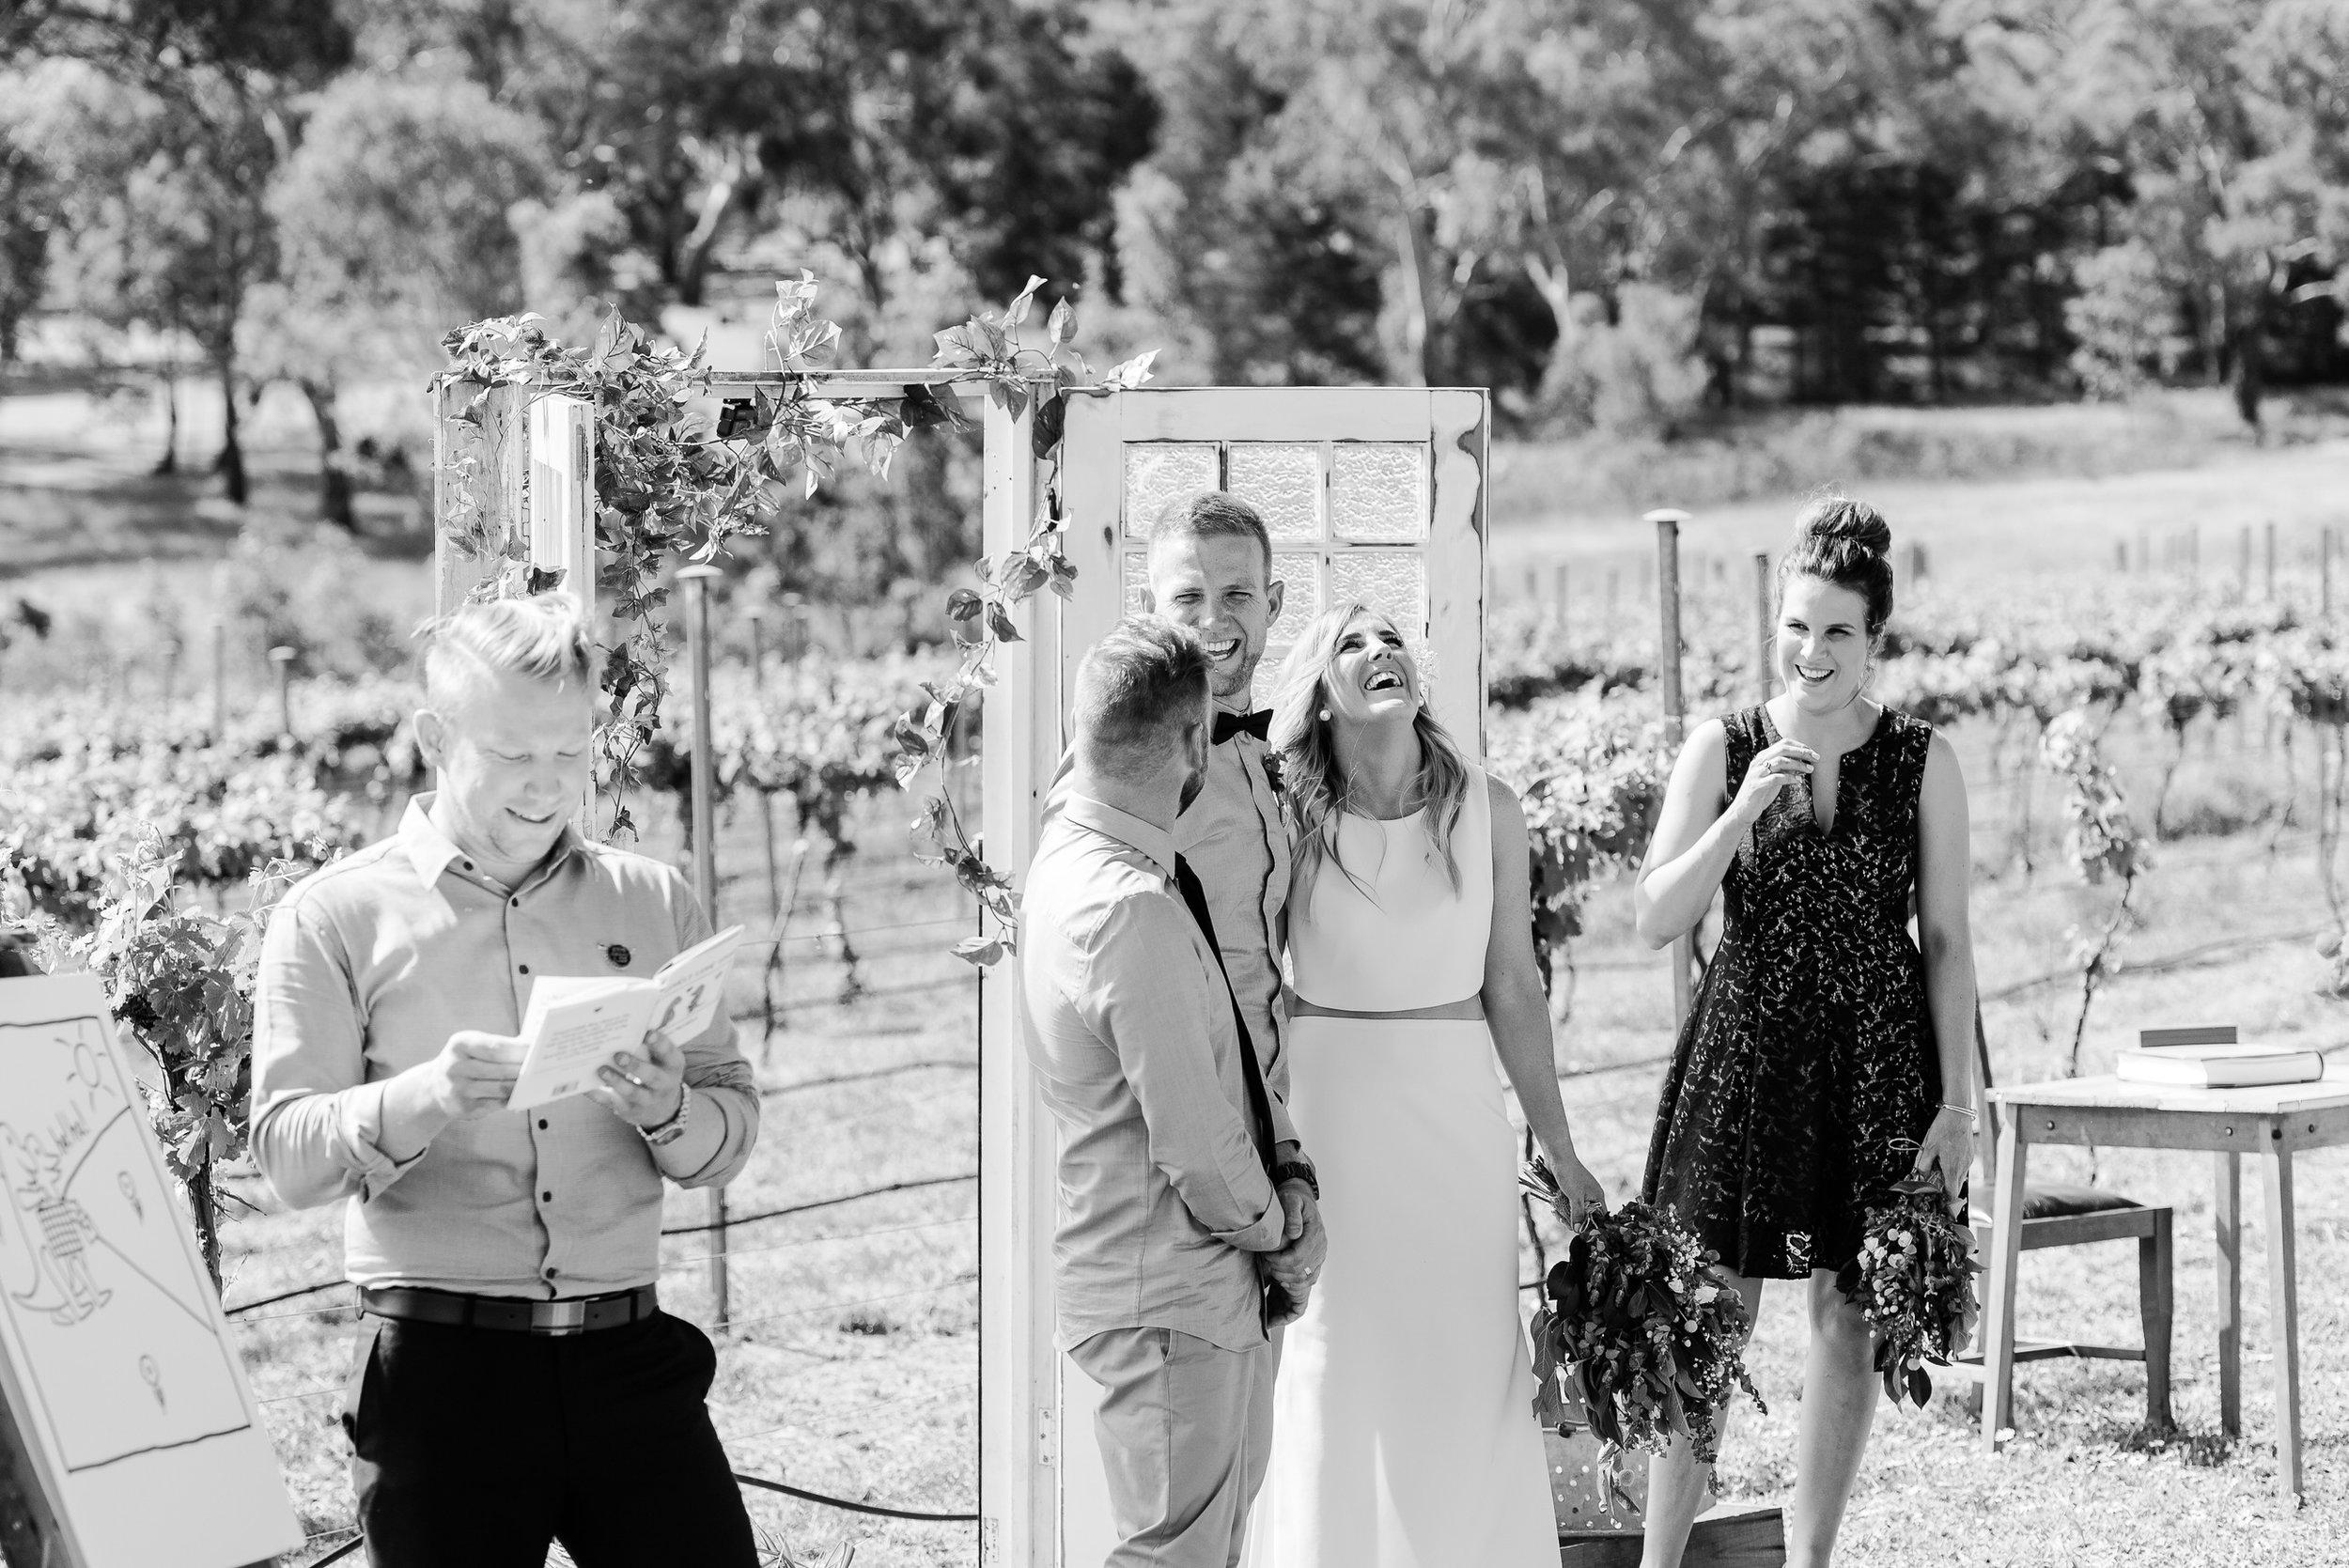 Bendigo_Wedding_Photography_Justin_Jim_BelvoirPark-149.JPG